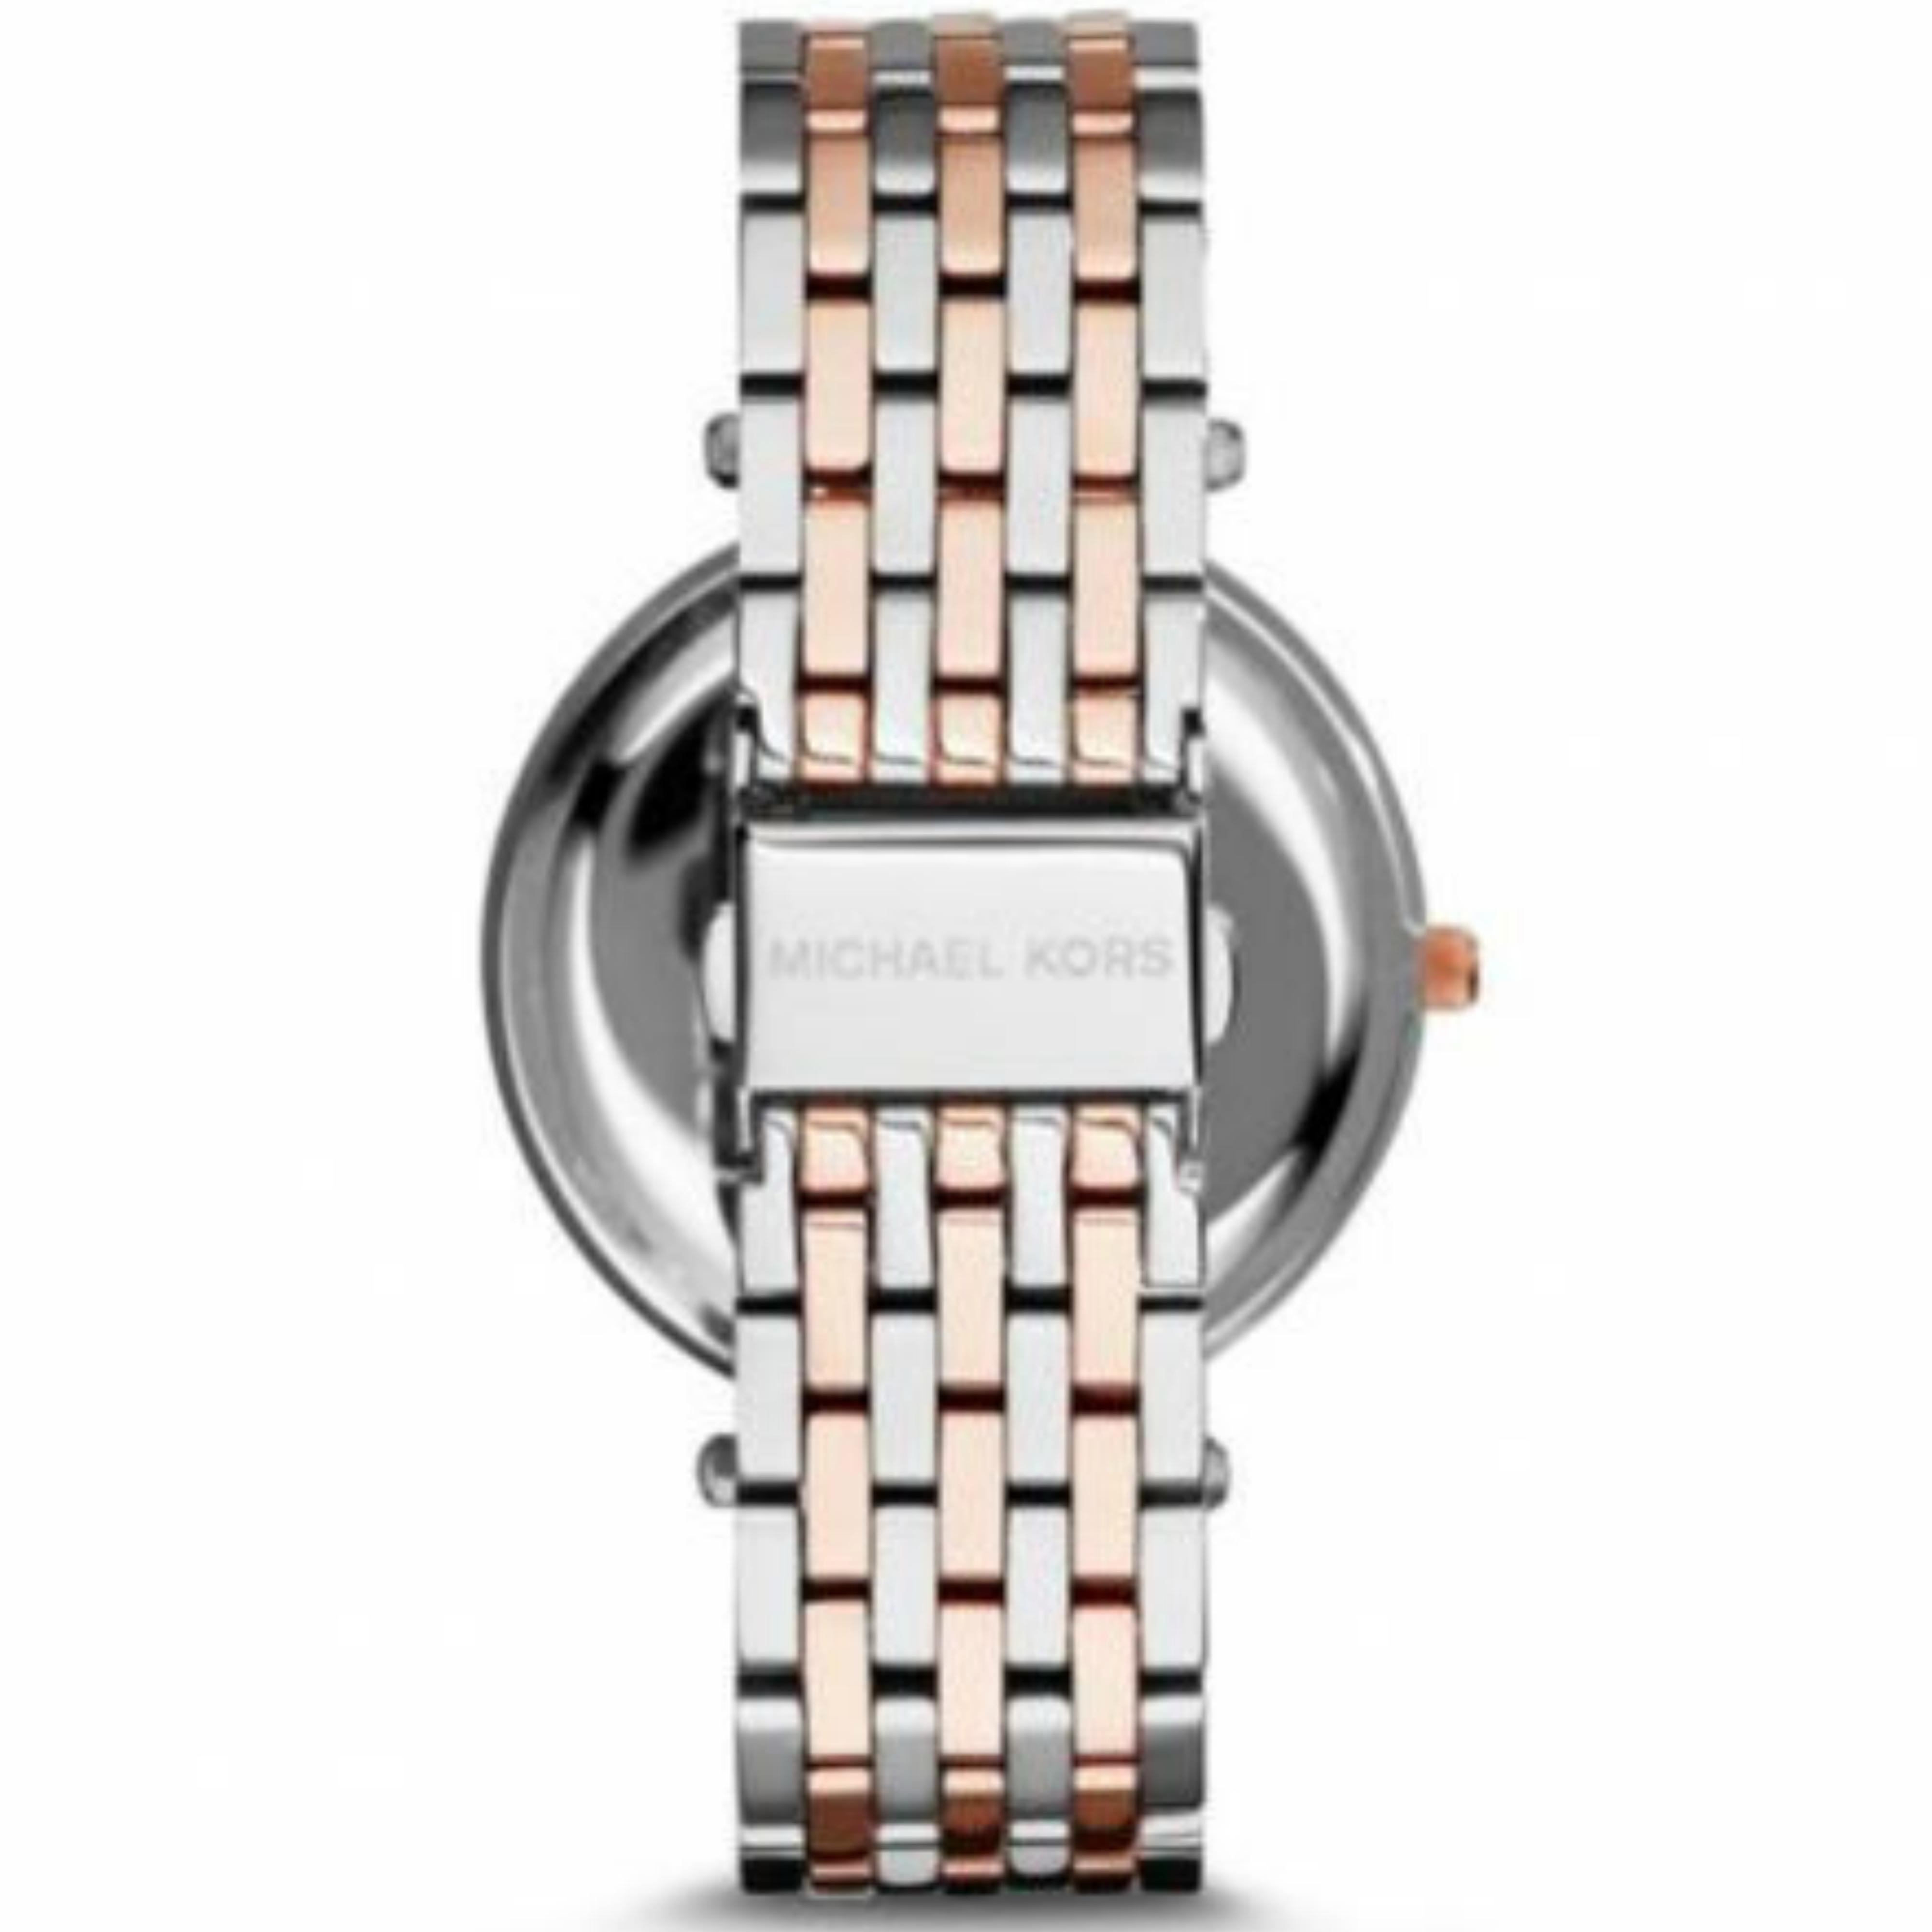 b18be8dc958f Sentinel Michael Kors Darci Women s Fashion Watch│Round Purple Dial│Two  Tone Strap│MK3353